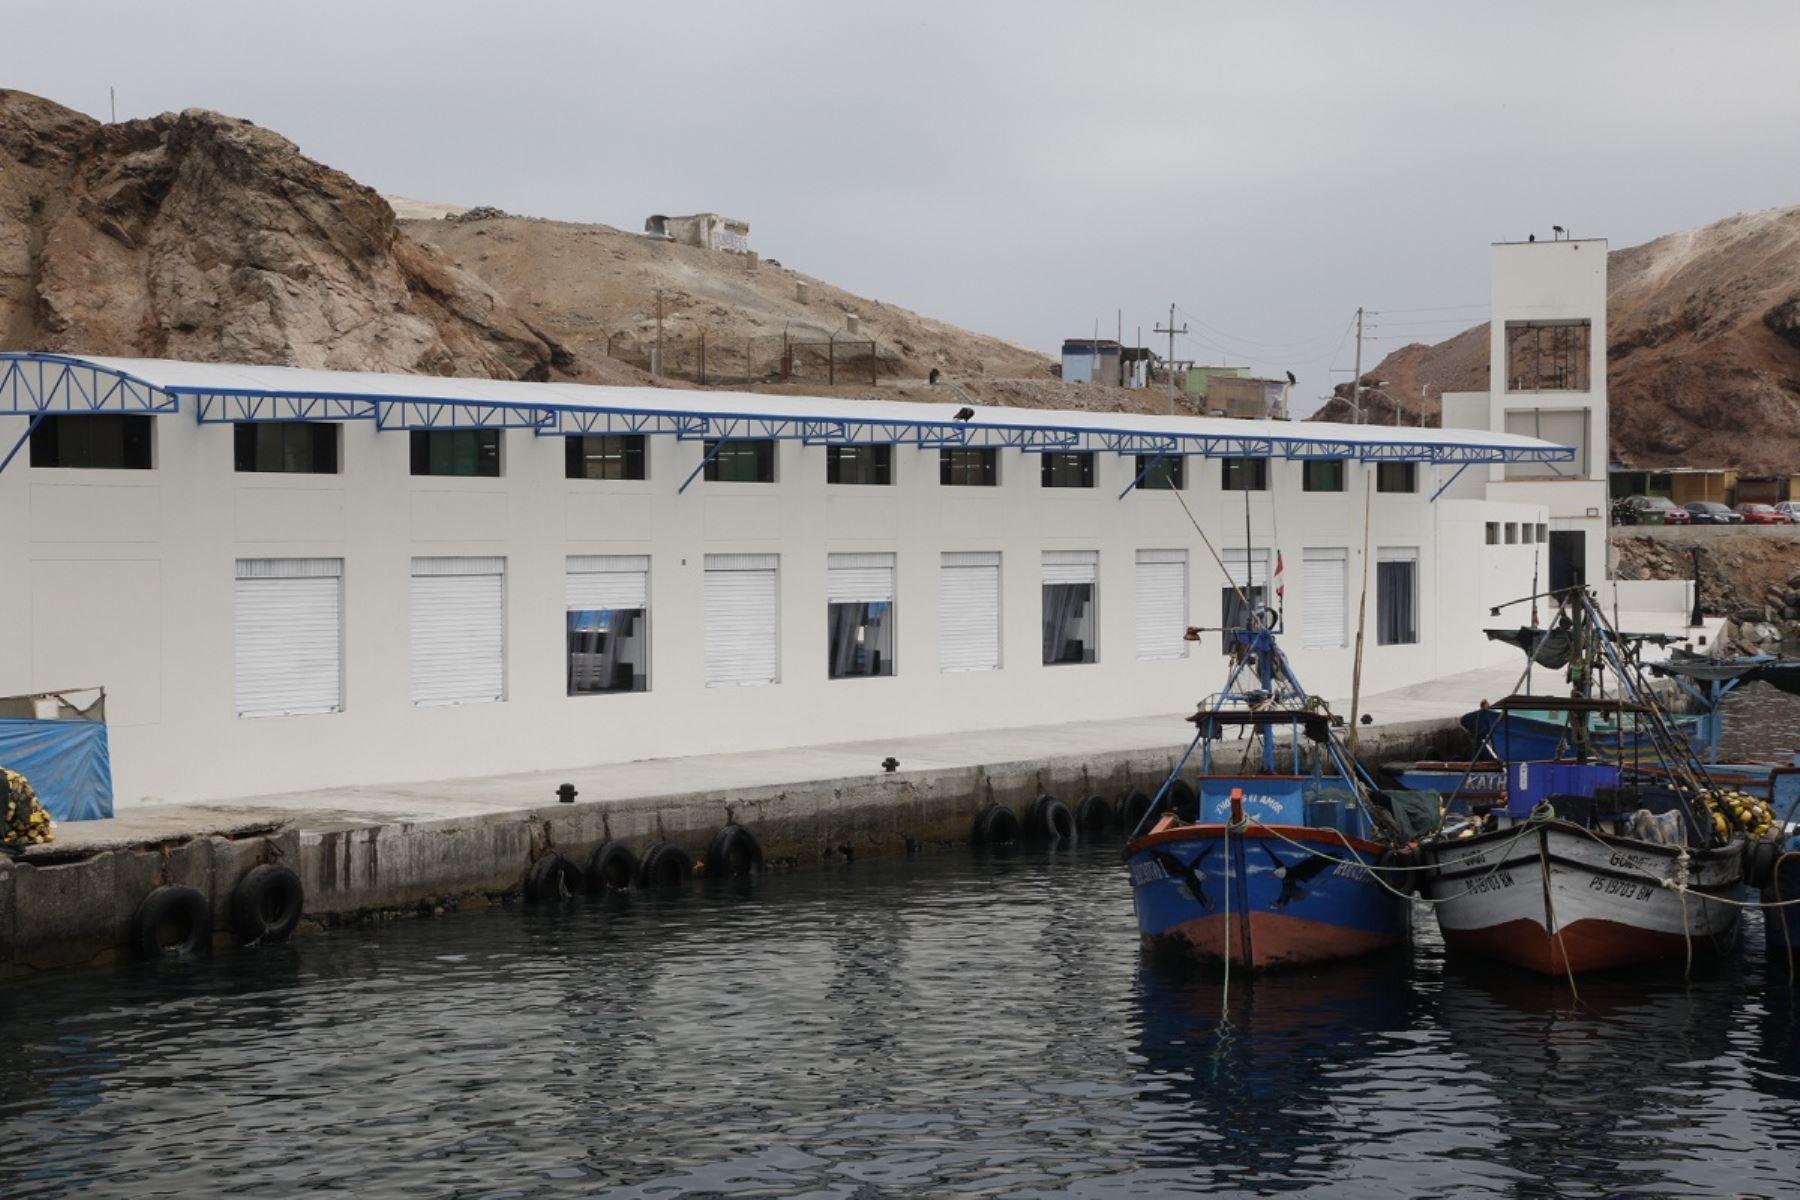 Desembarcadero Pesquero Artesanal modernizado. Foto: Cortesía